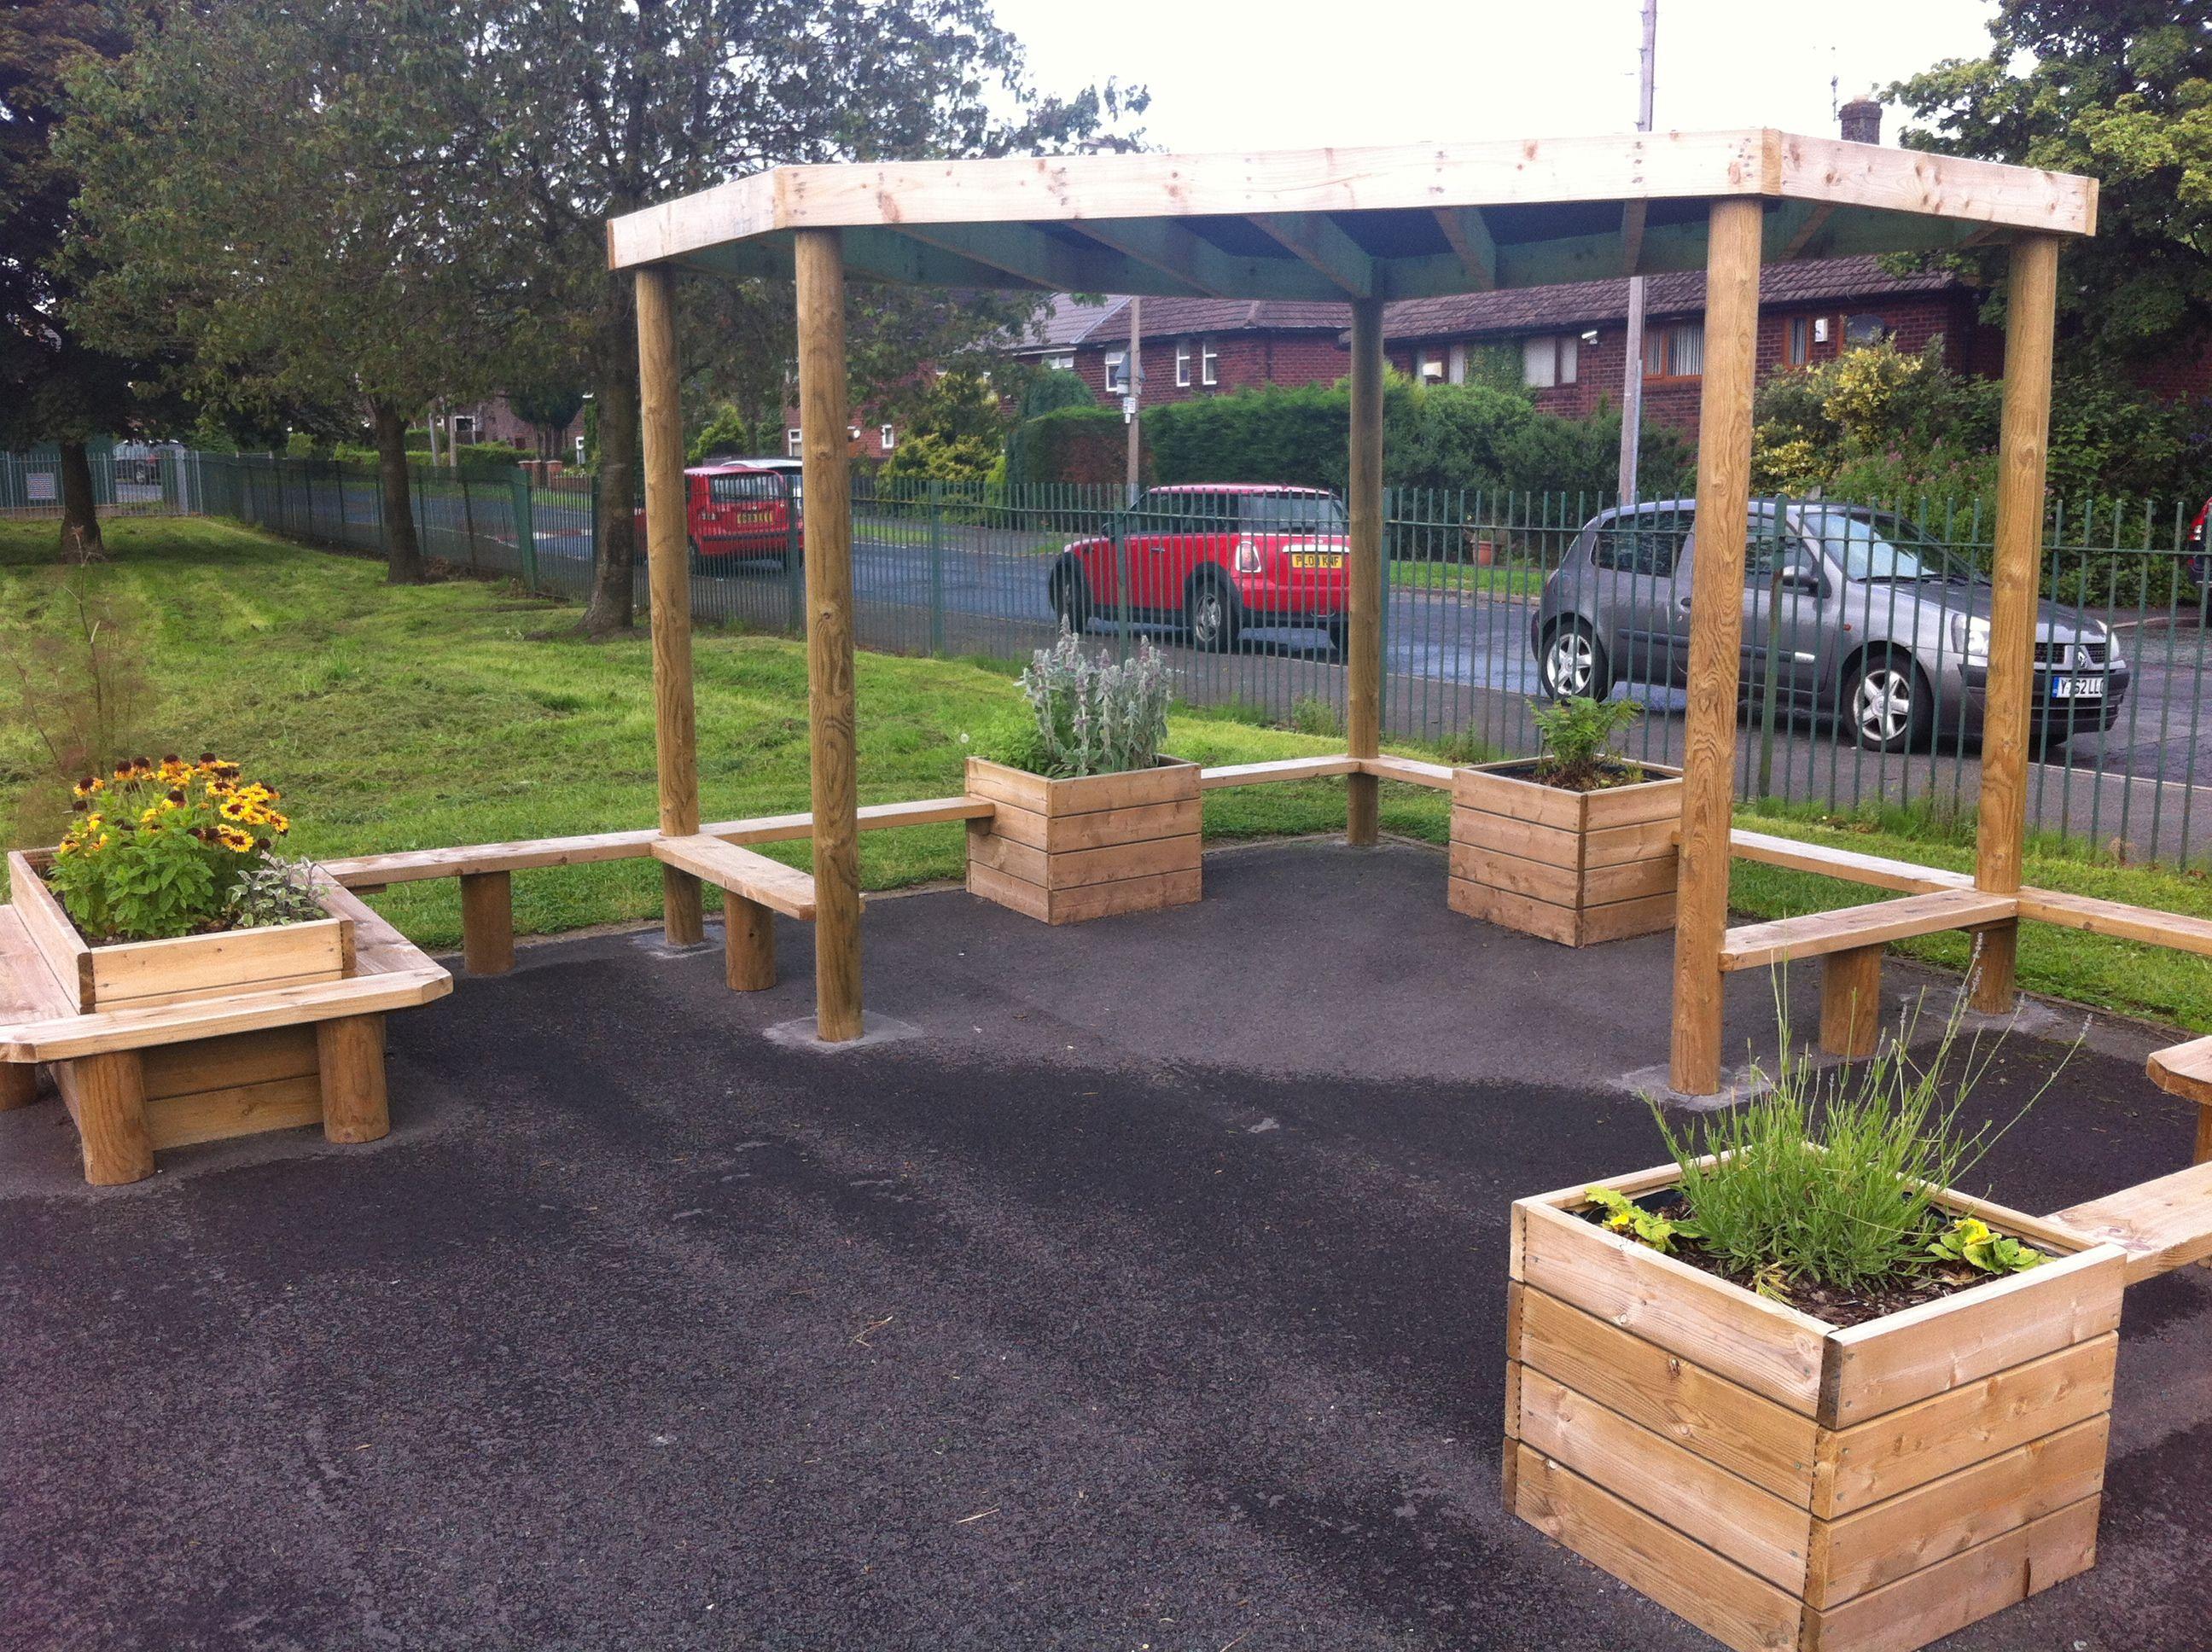 Admirable Playground Pergola With Bench Seating Planters Quiet Uwap Interior Chair Design Uwaporg